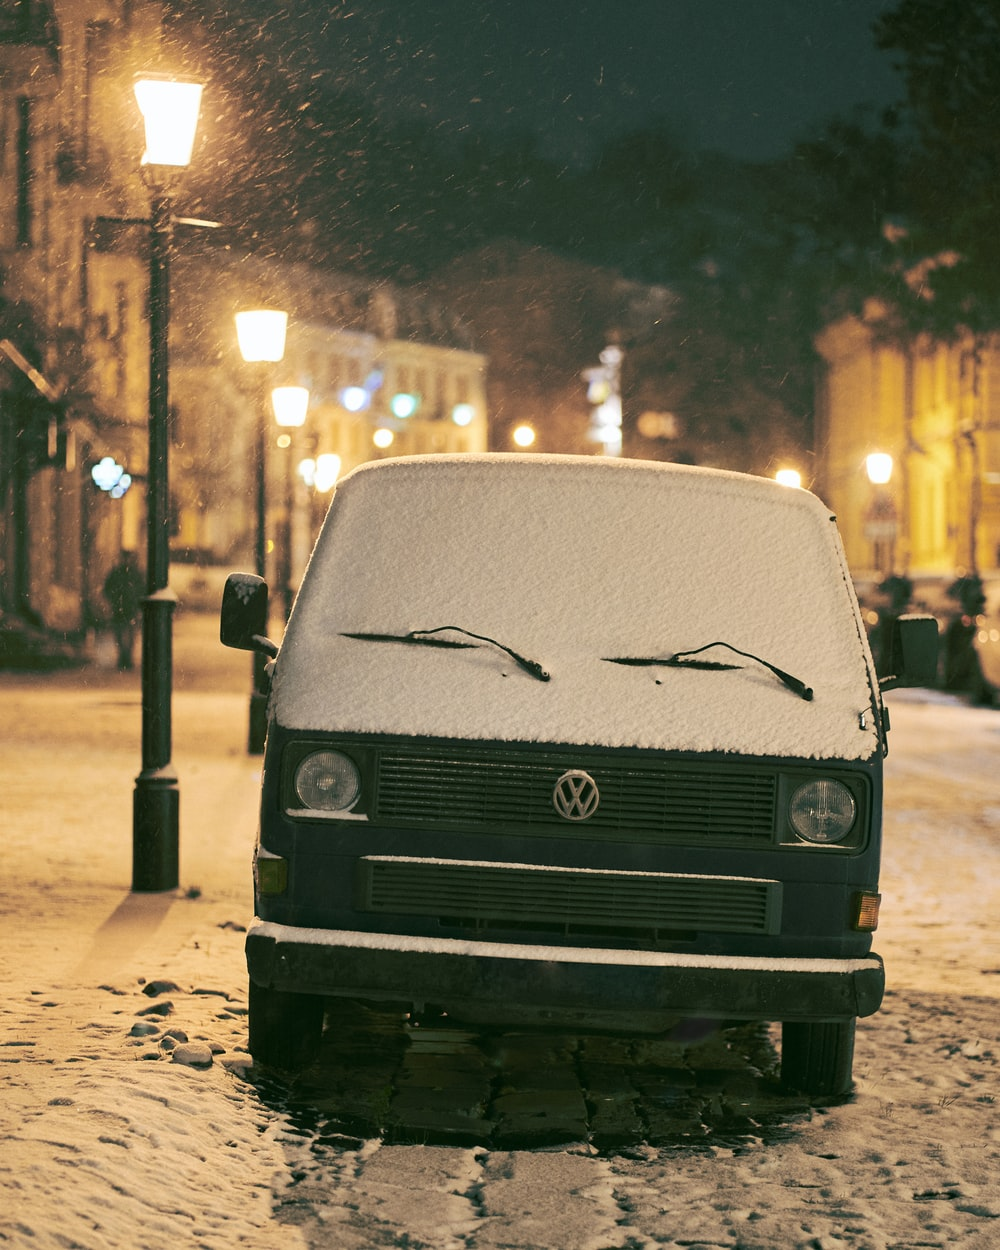 blue volkswagen van on road during night time